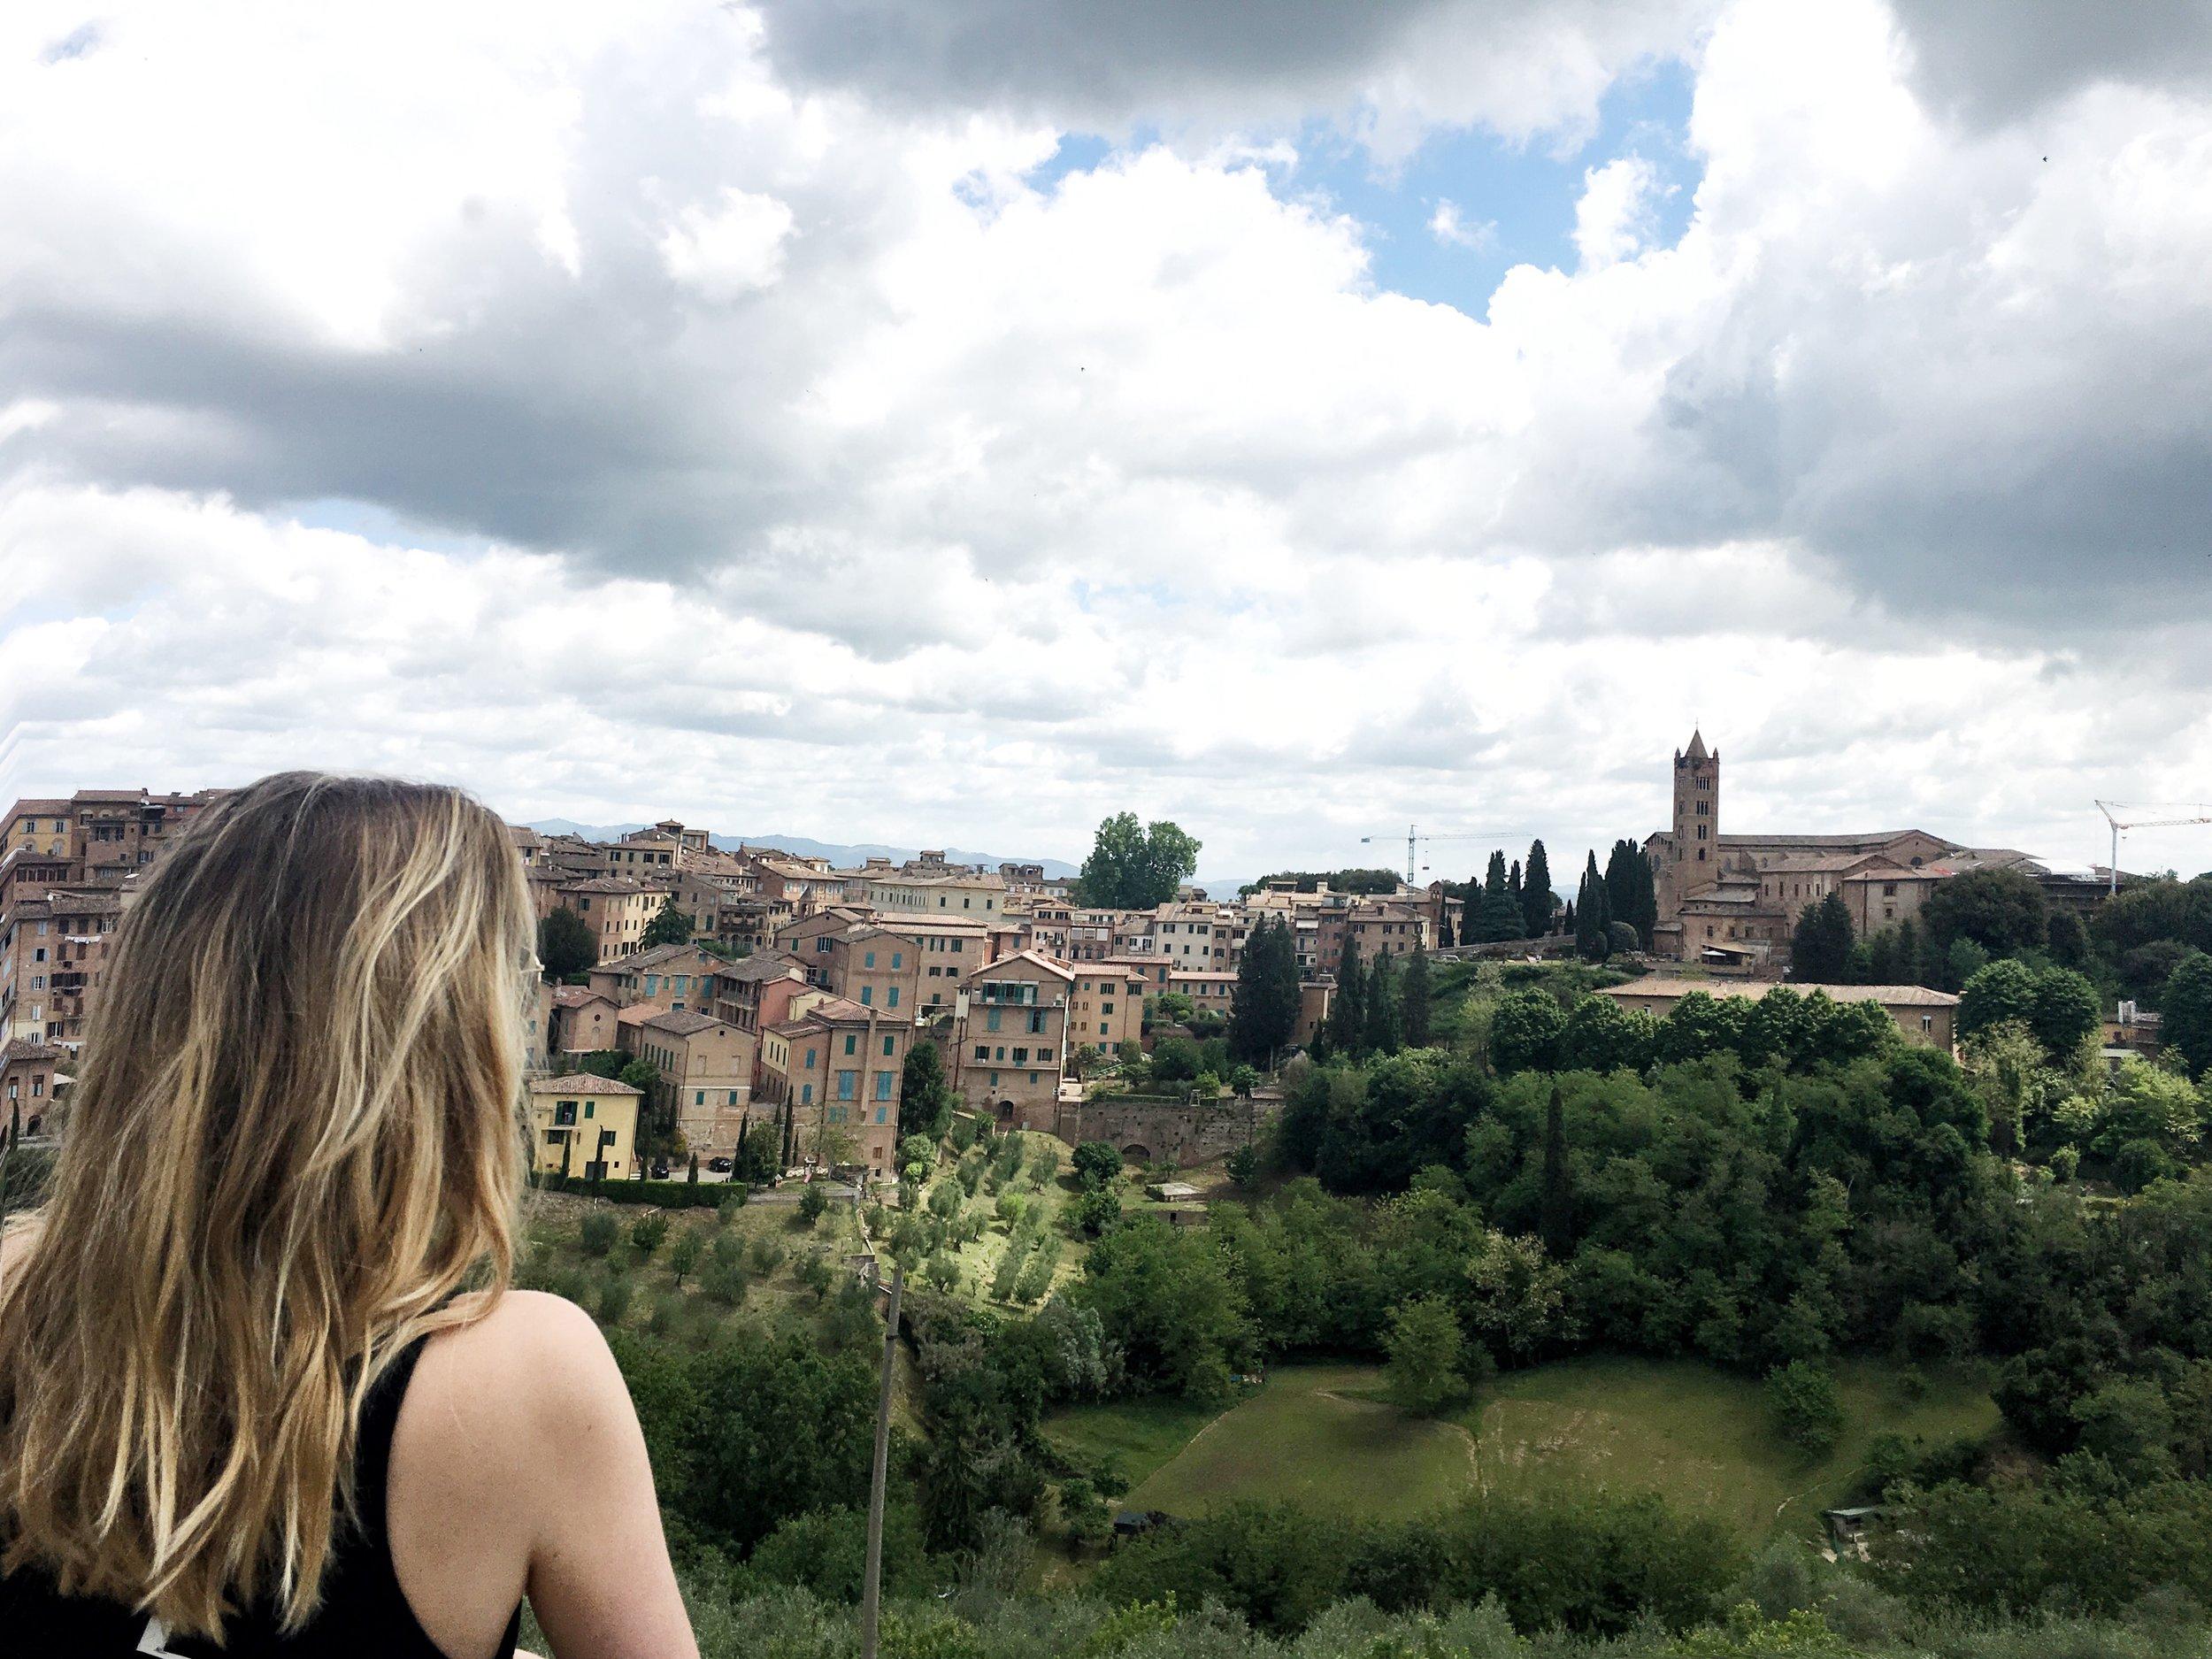 Panoramic view of Siena, Italy